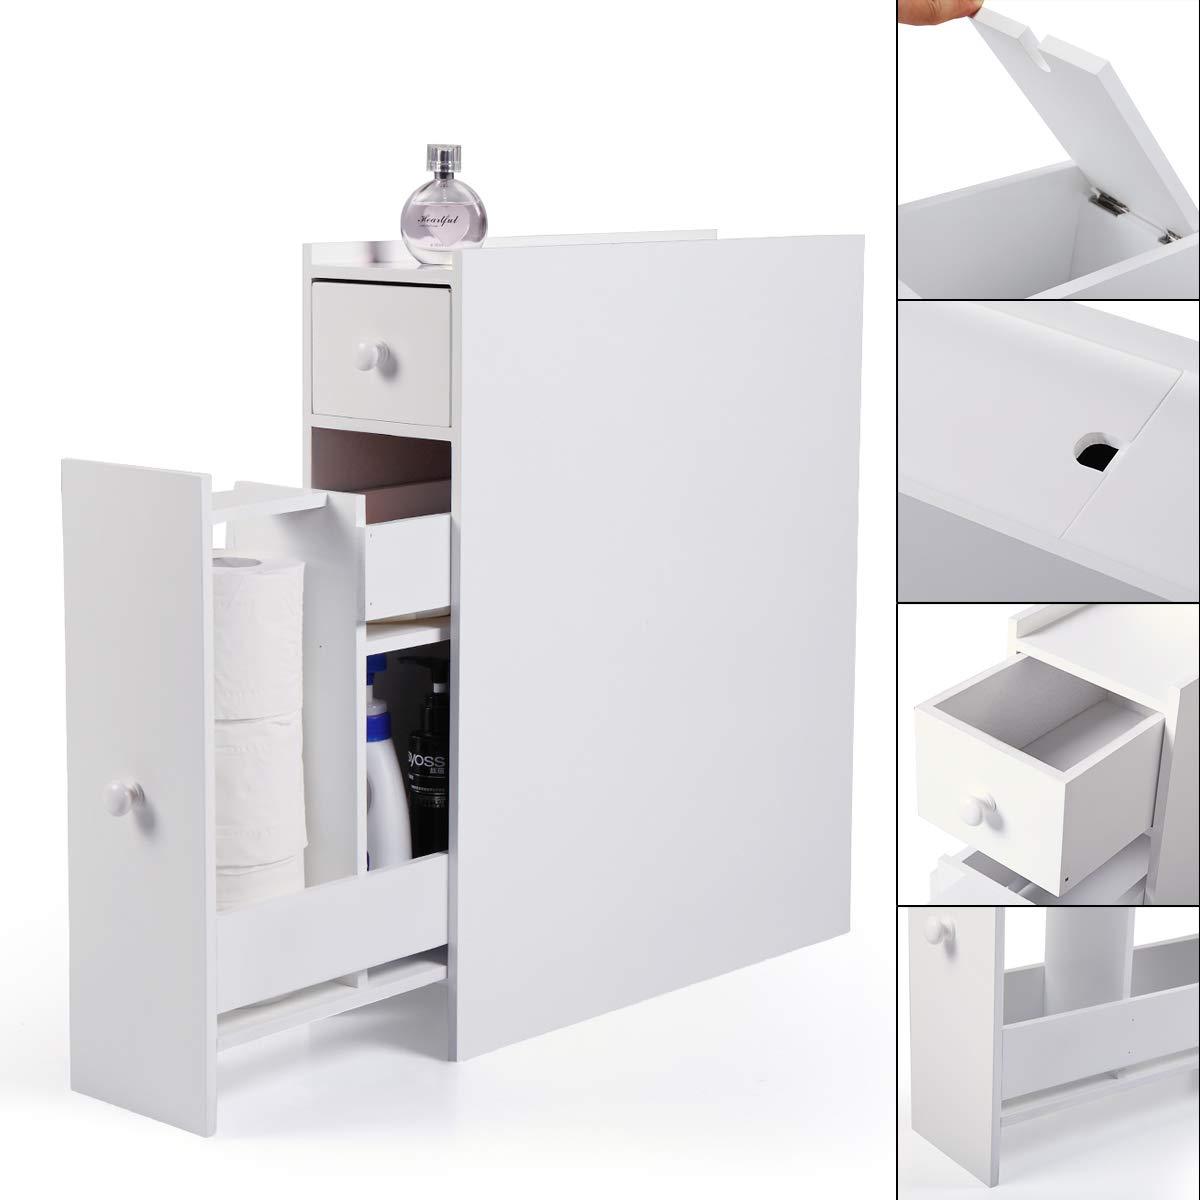 JAXPETY Wood Bathroom Storage Floor Cabinet Toilet Organizer w/Drawers White by JAXPETY